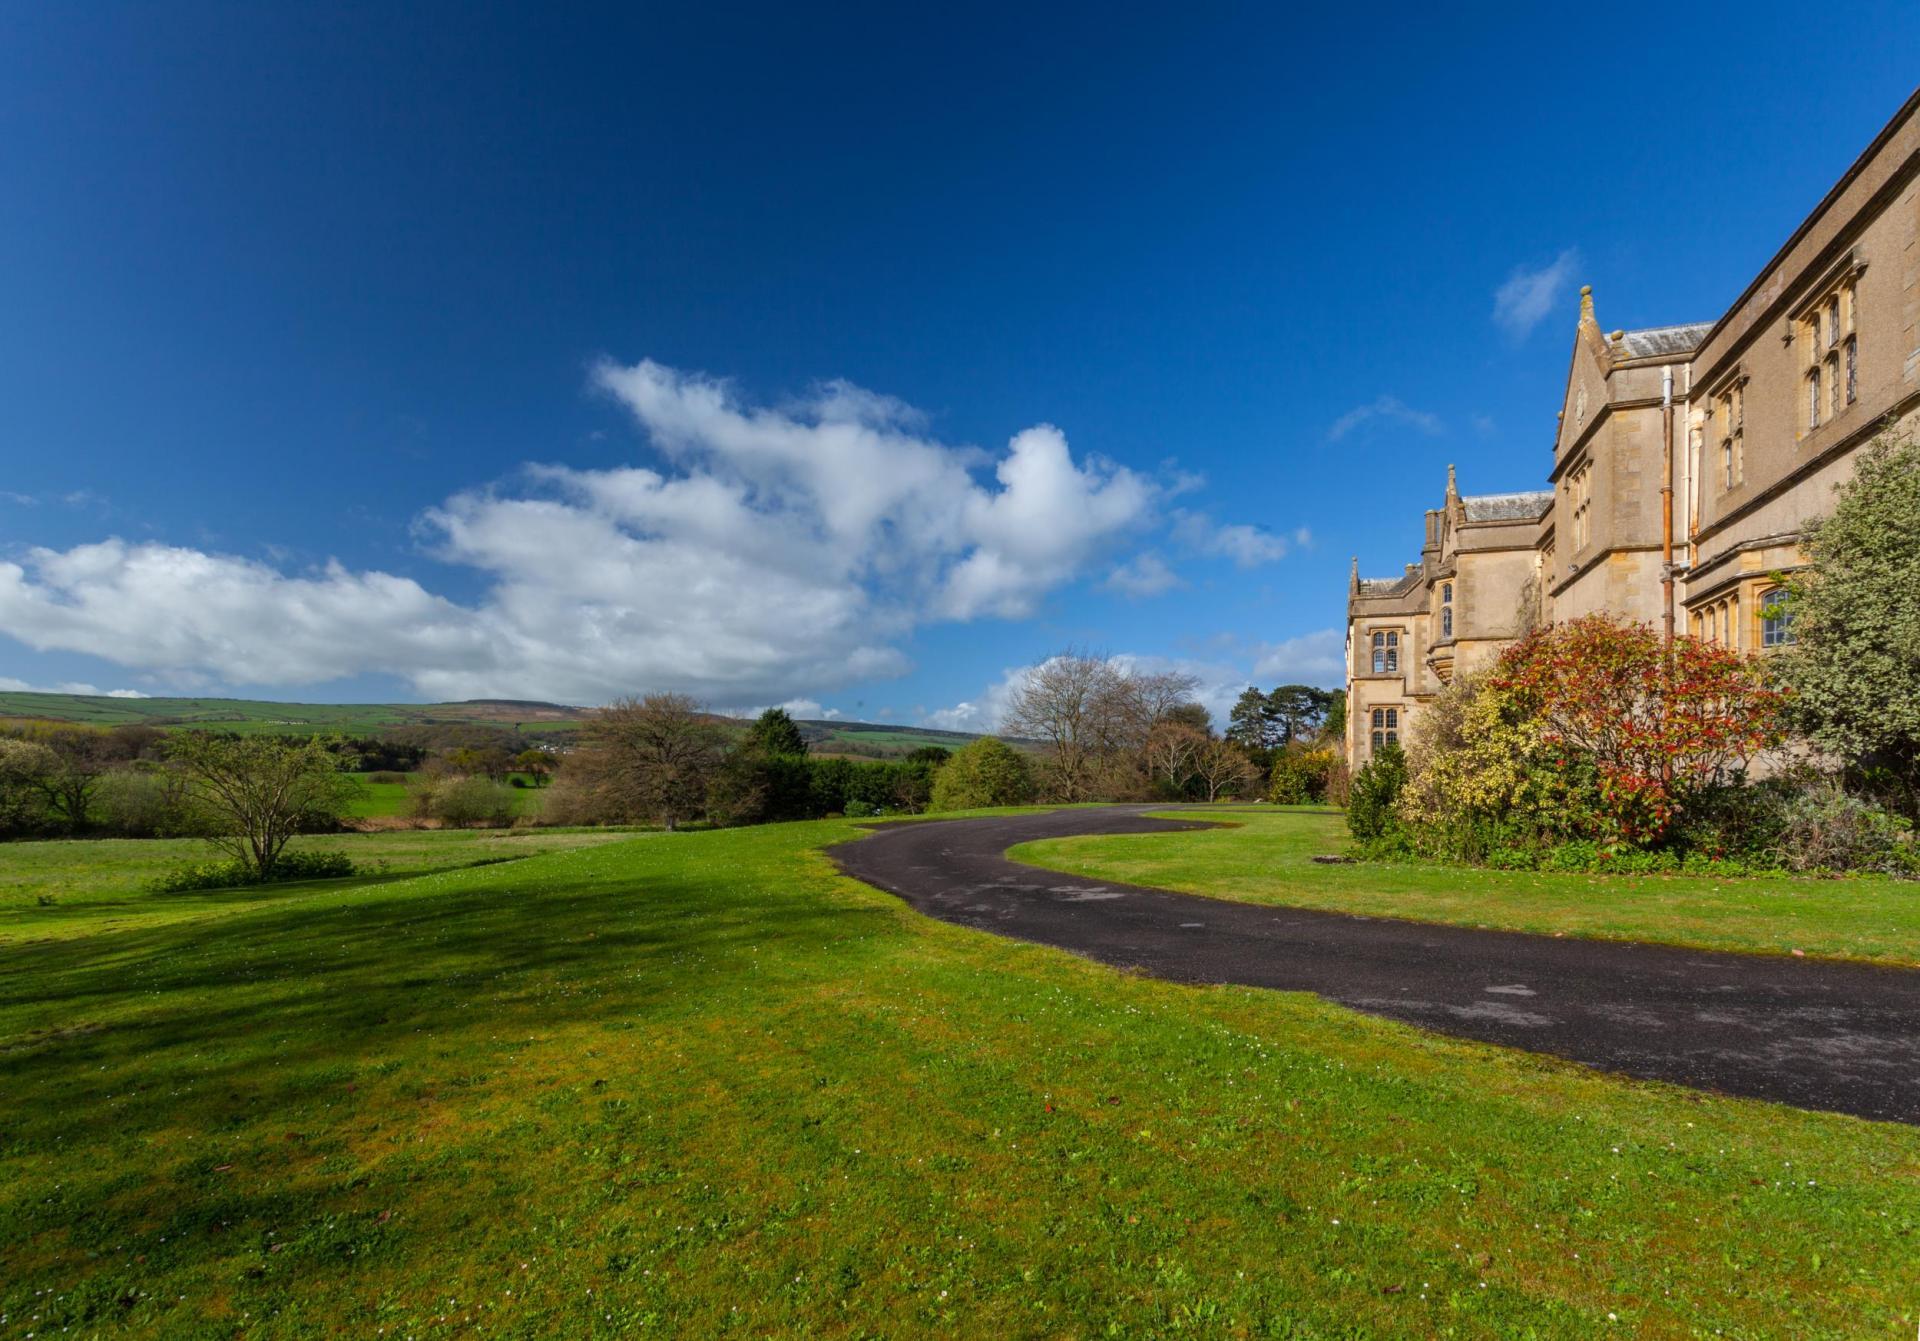 8 Bedroom Detached House For Sale In Somerset